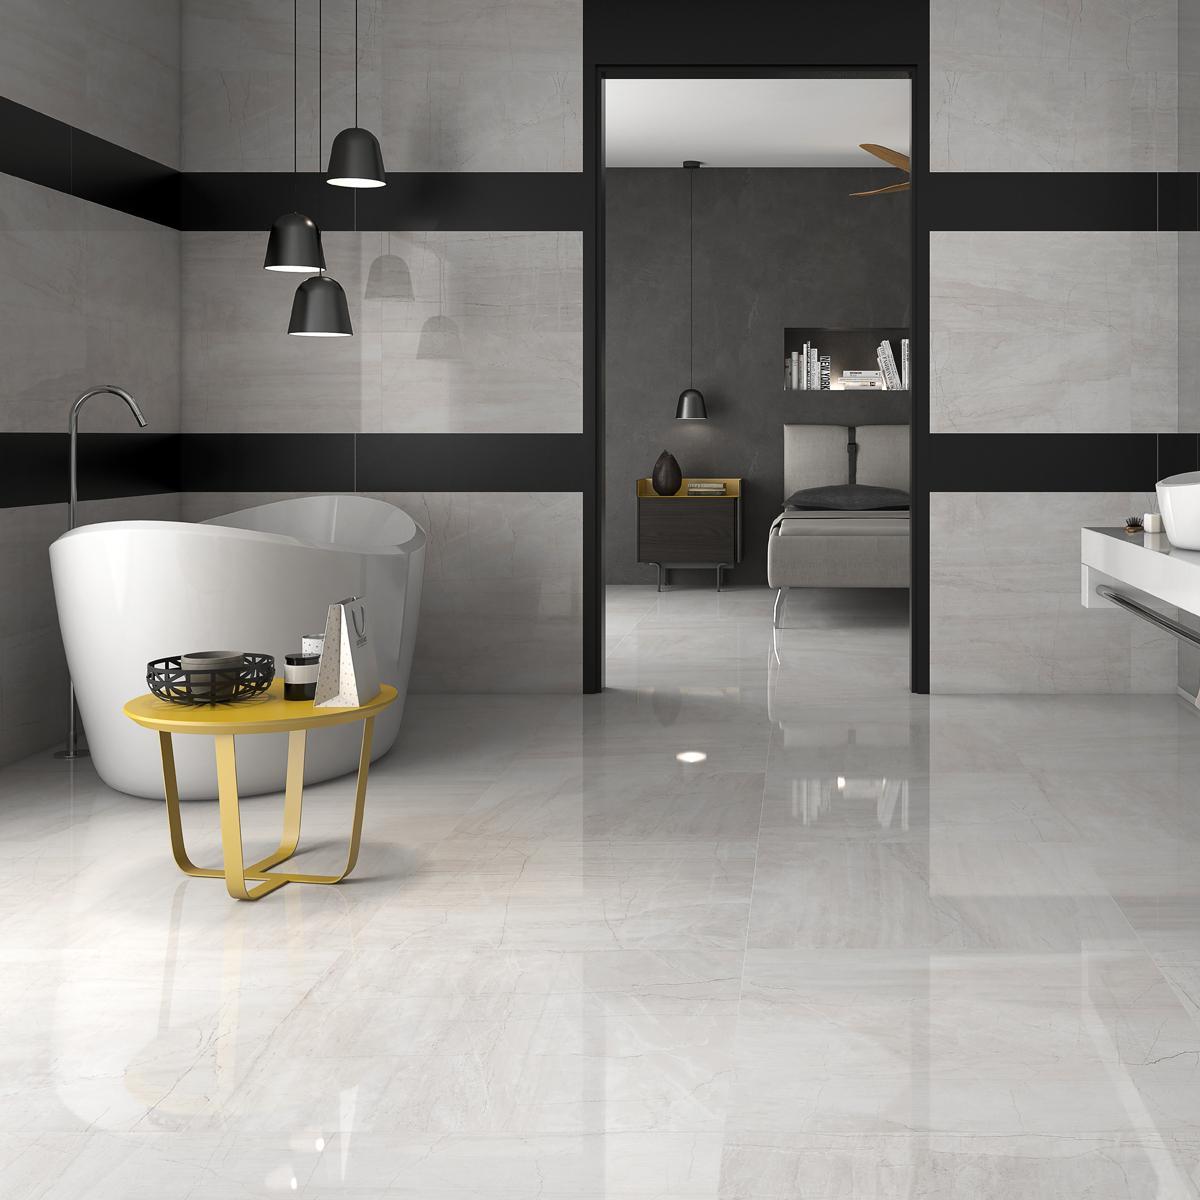 Porcelanato Sweet Blanco Brillante - 60X60 cm - 1.44 m2